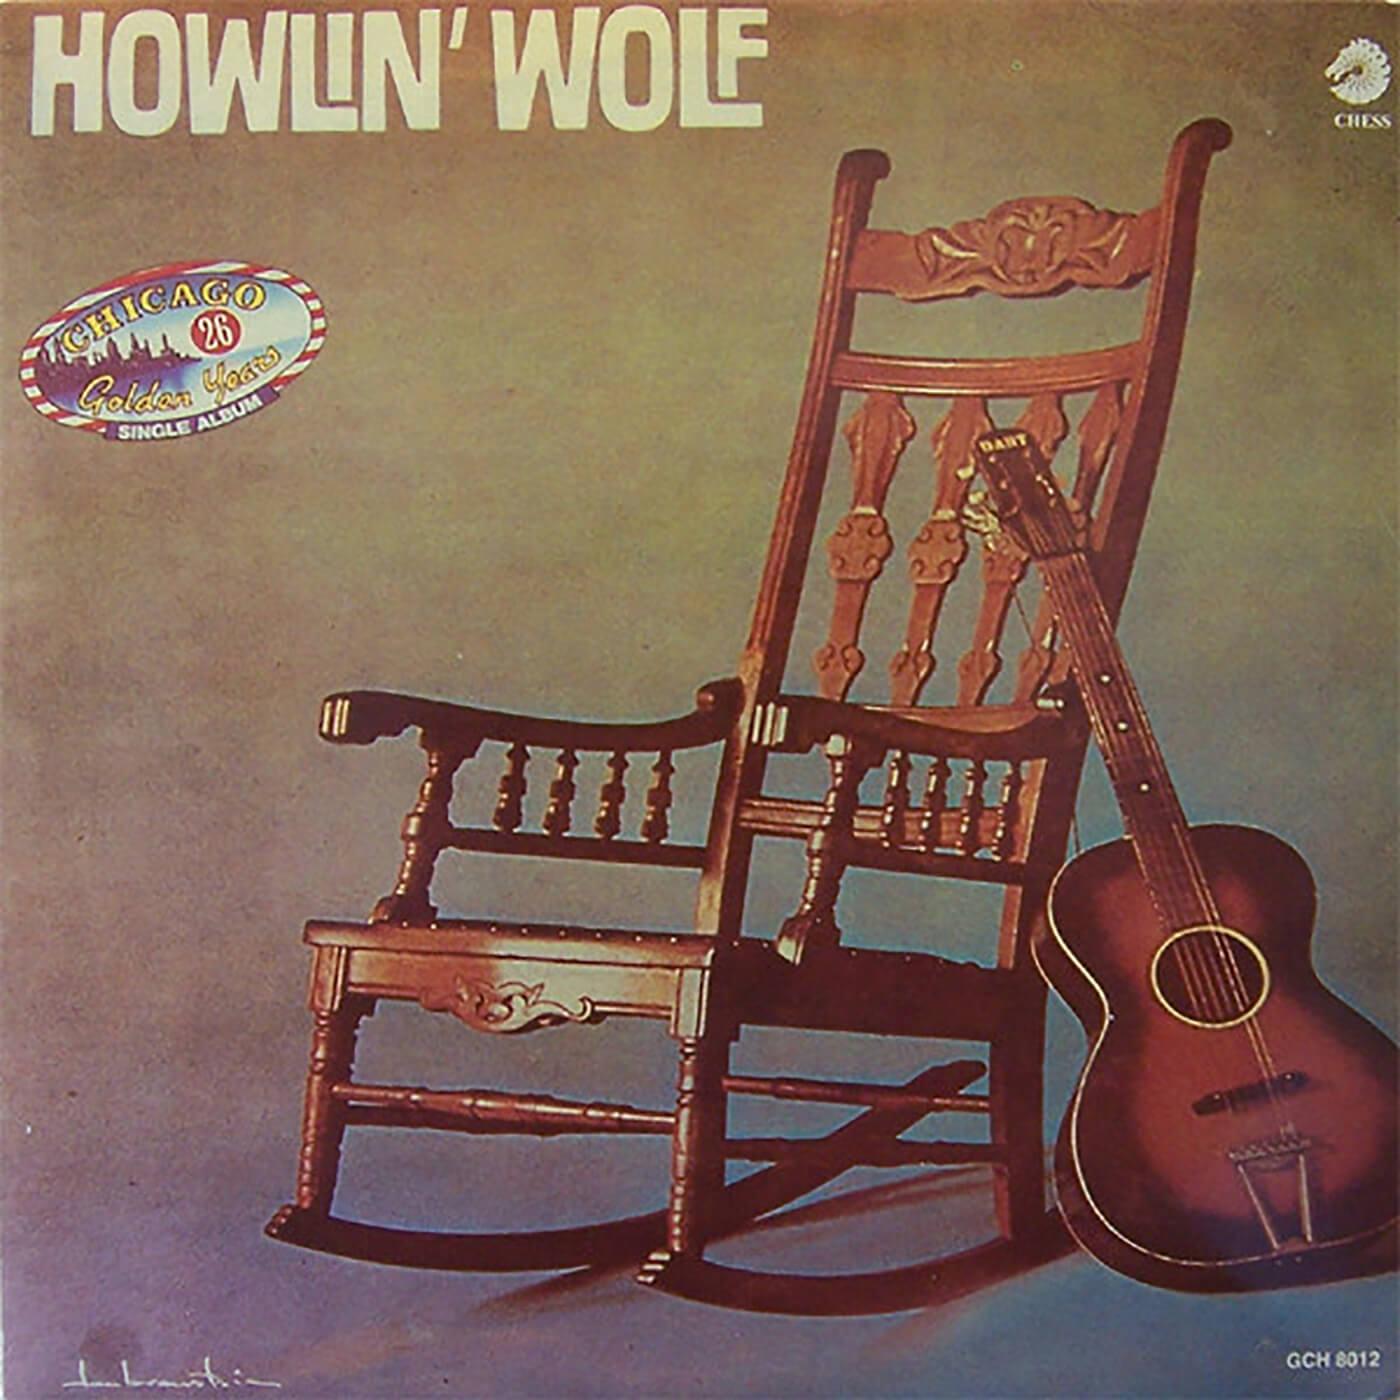 Howlin' Wolf - Howlin' Wolf